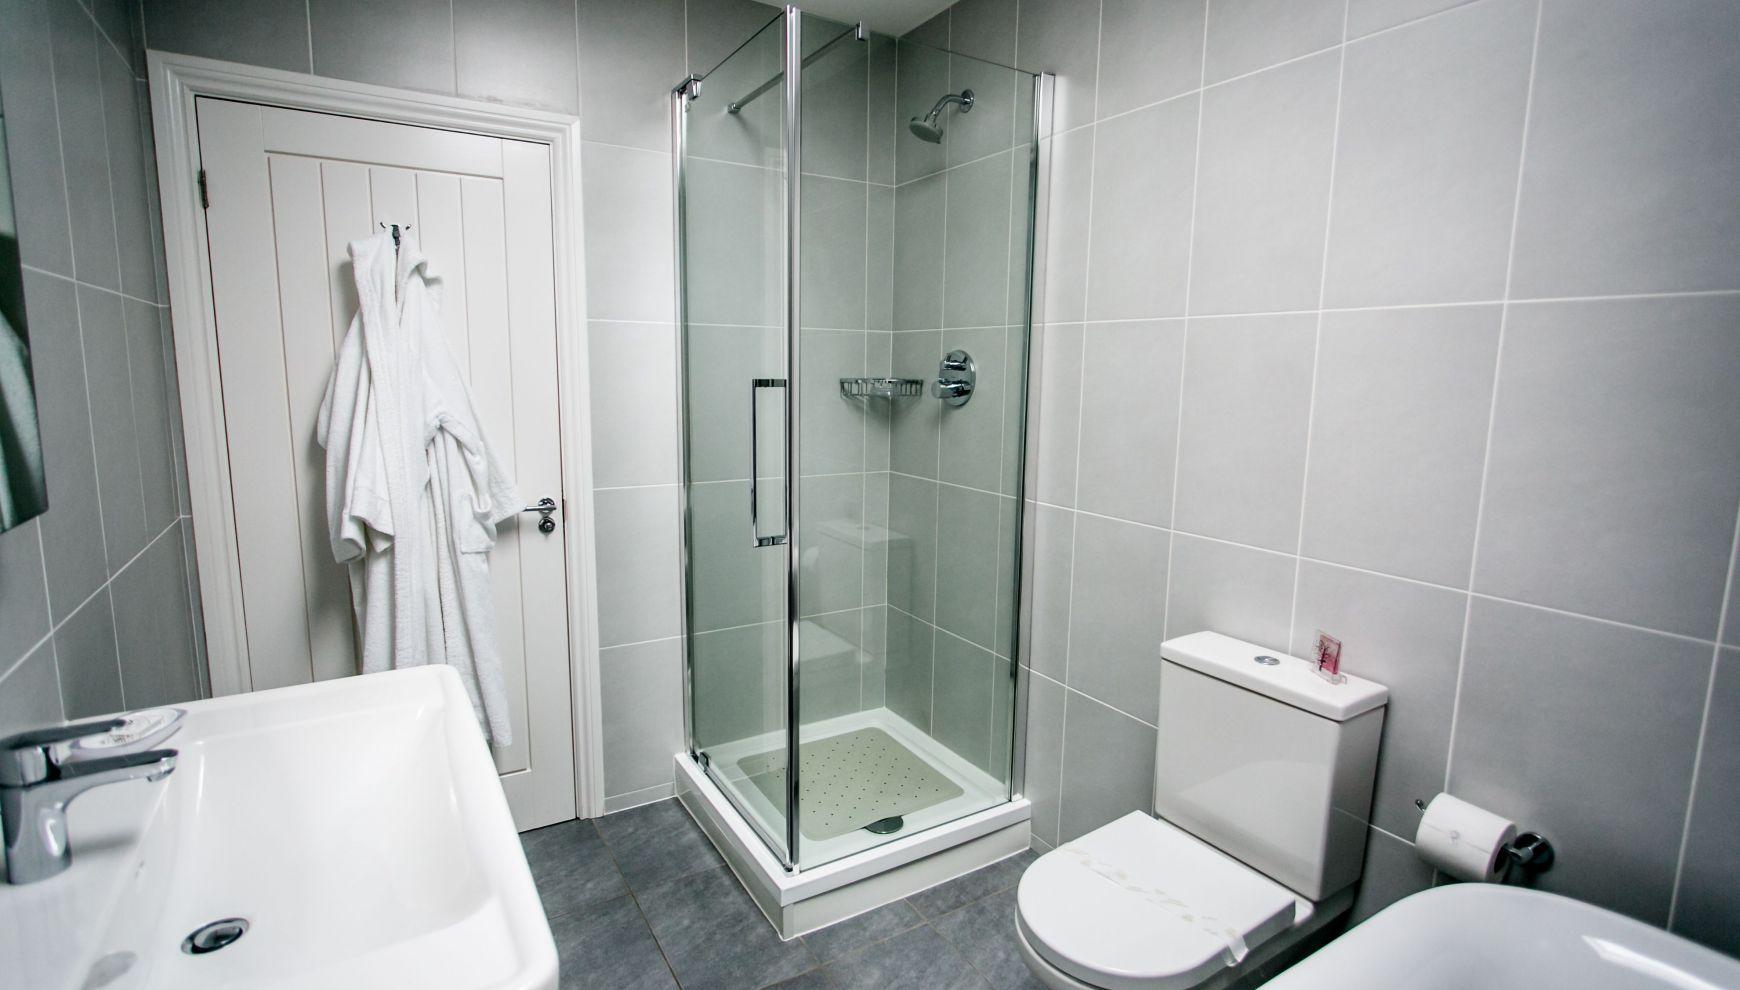 13/15 Shower